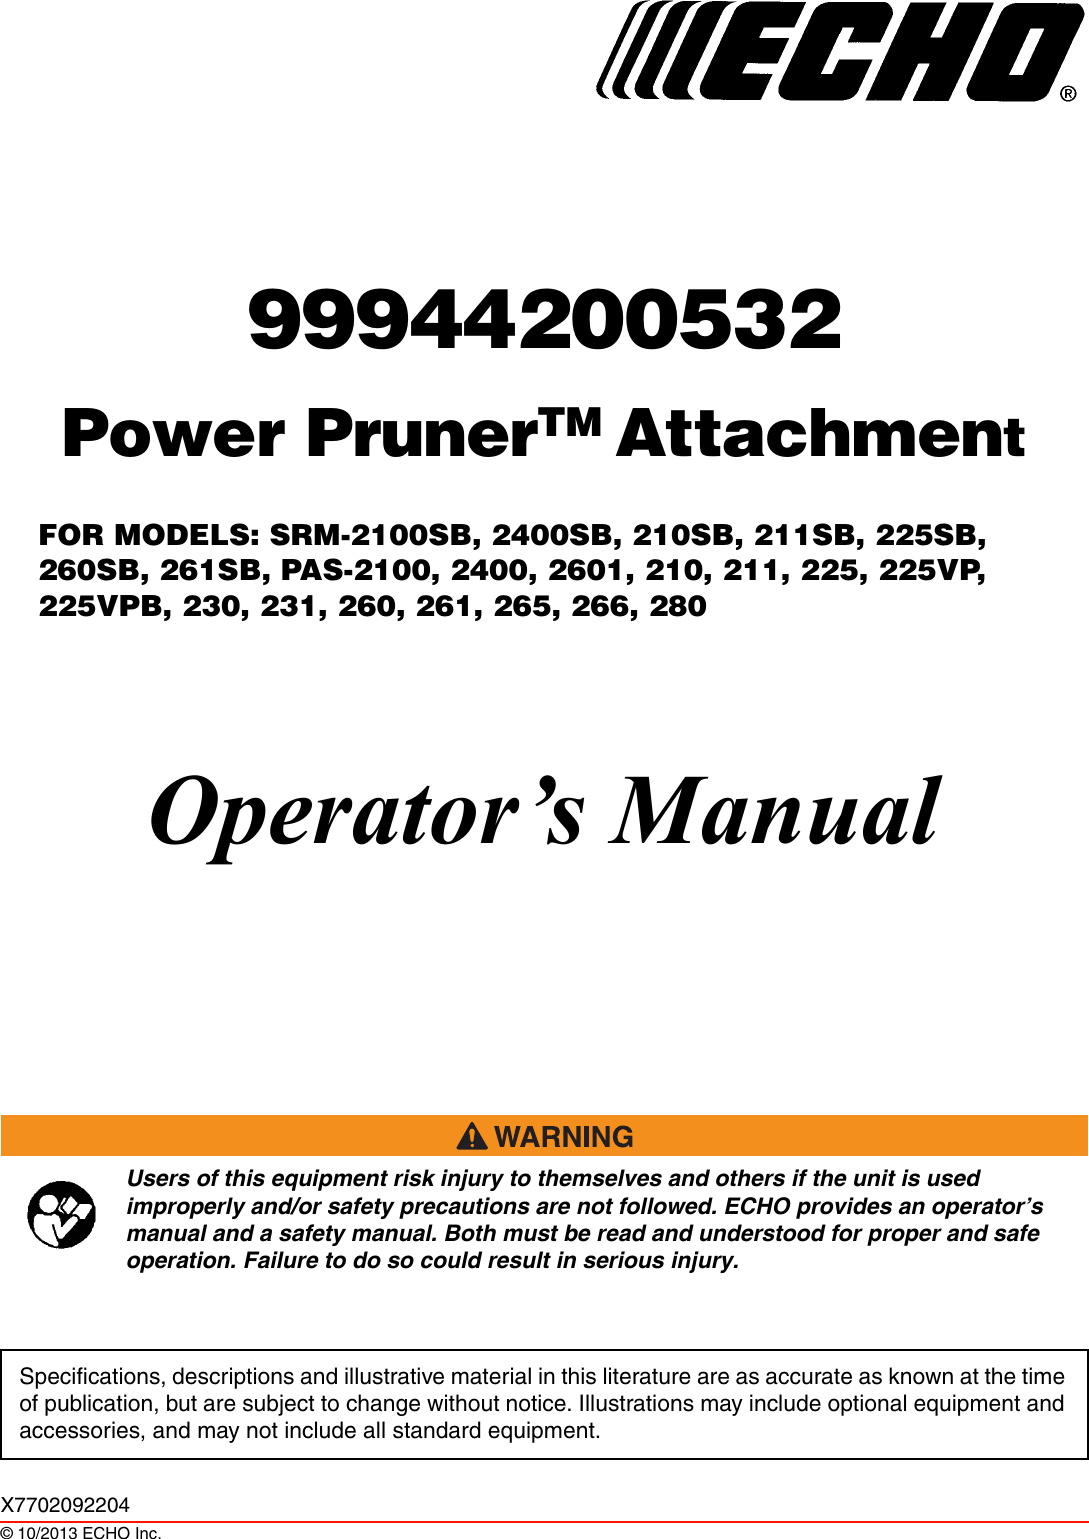 echo srm-2400 owners manual